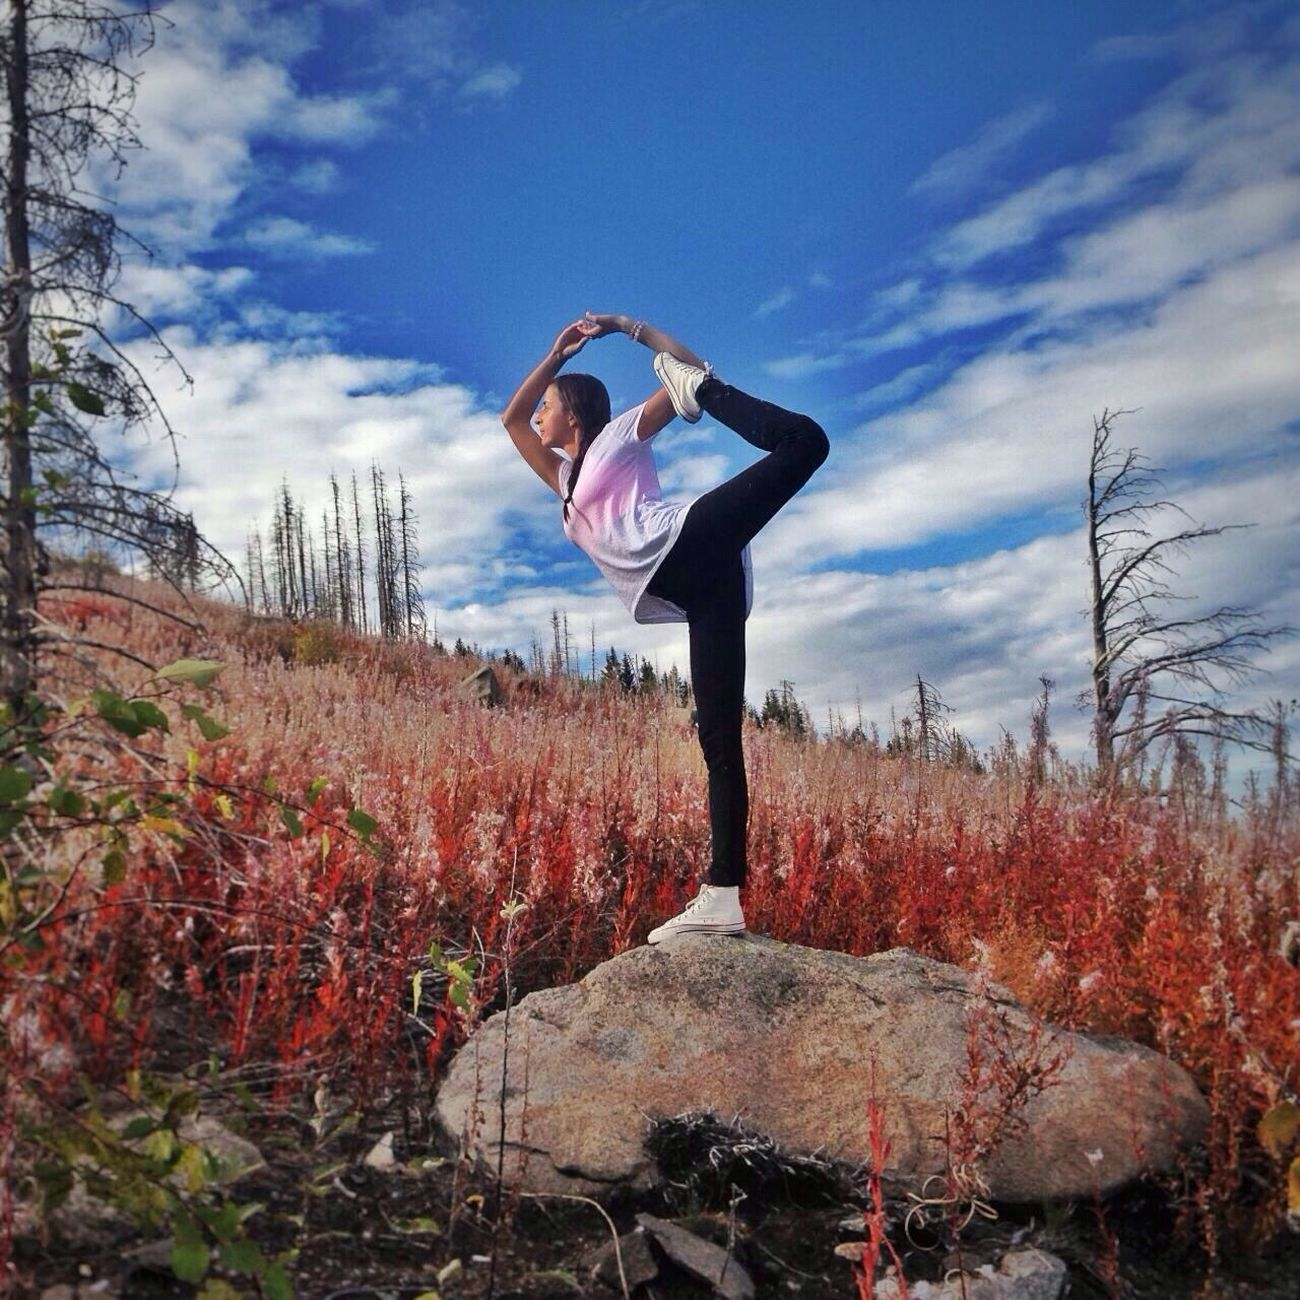 Yogapractice Yogalife Yogatime Yogainspiration Yogateacher Yogalove Yogagirl Yoga #Nature  Skyyoga